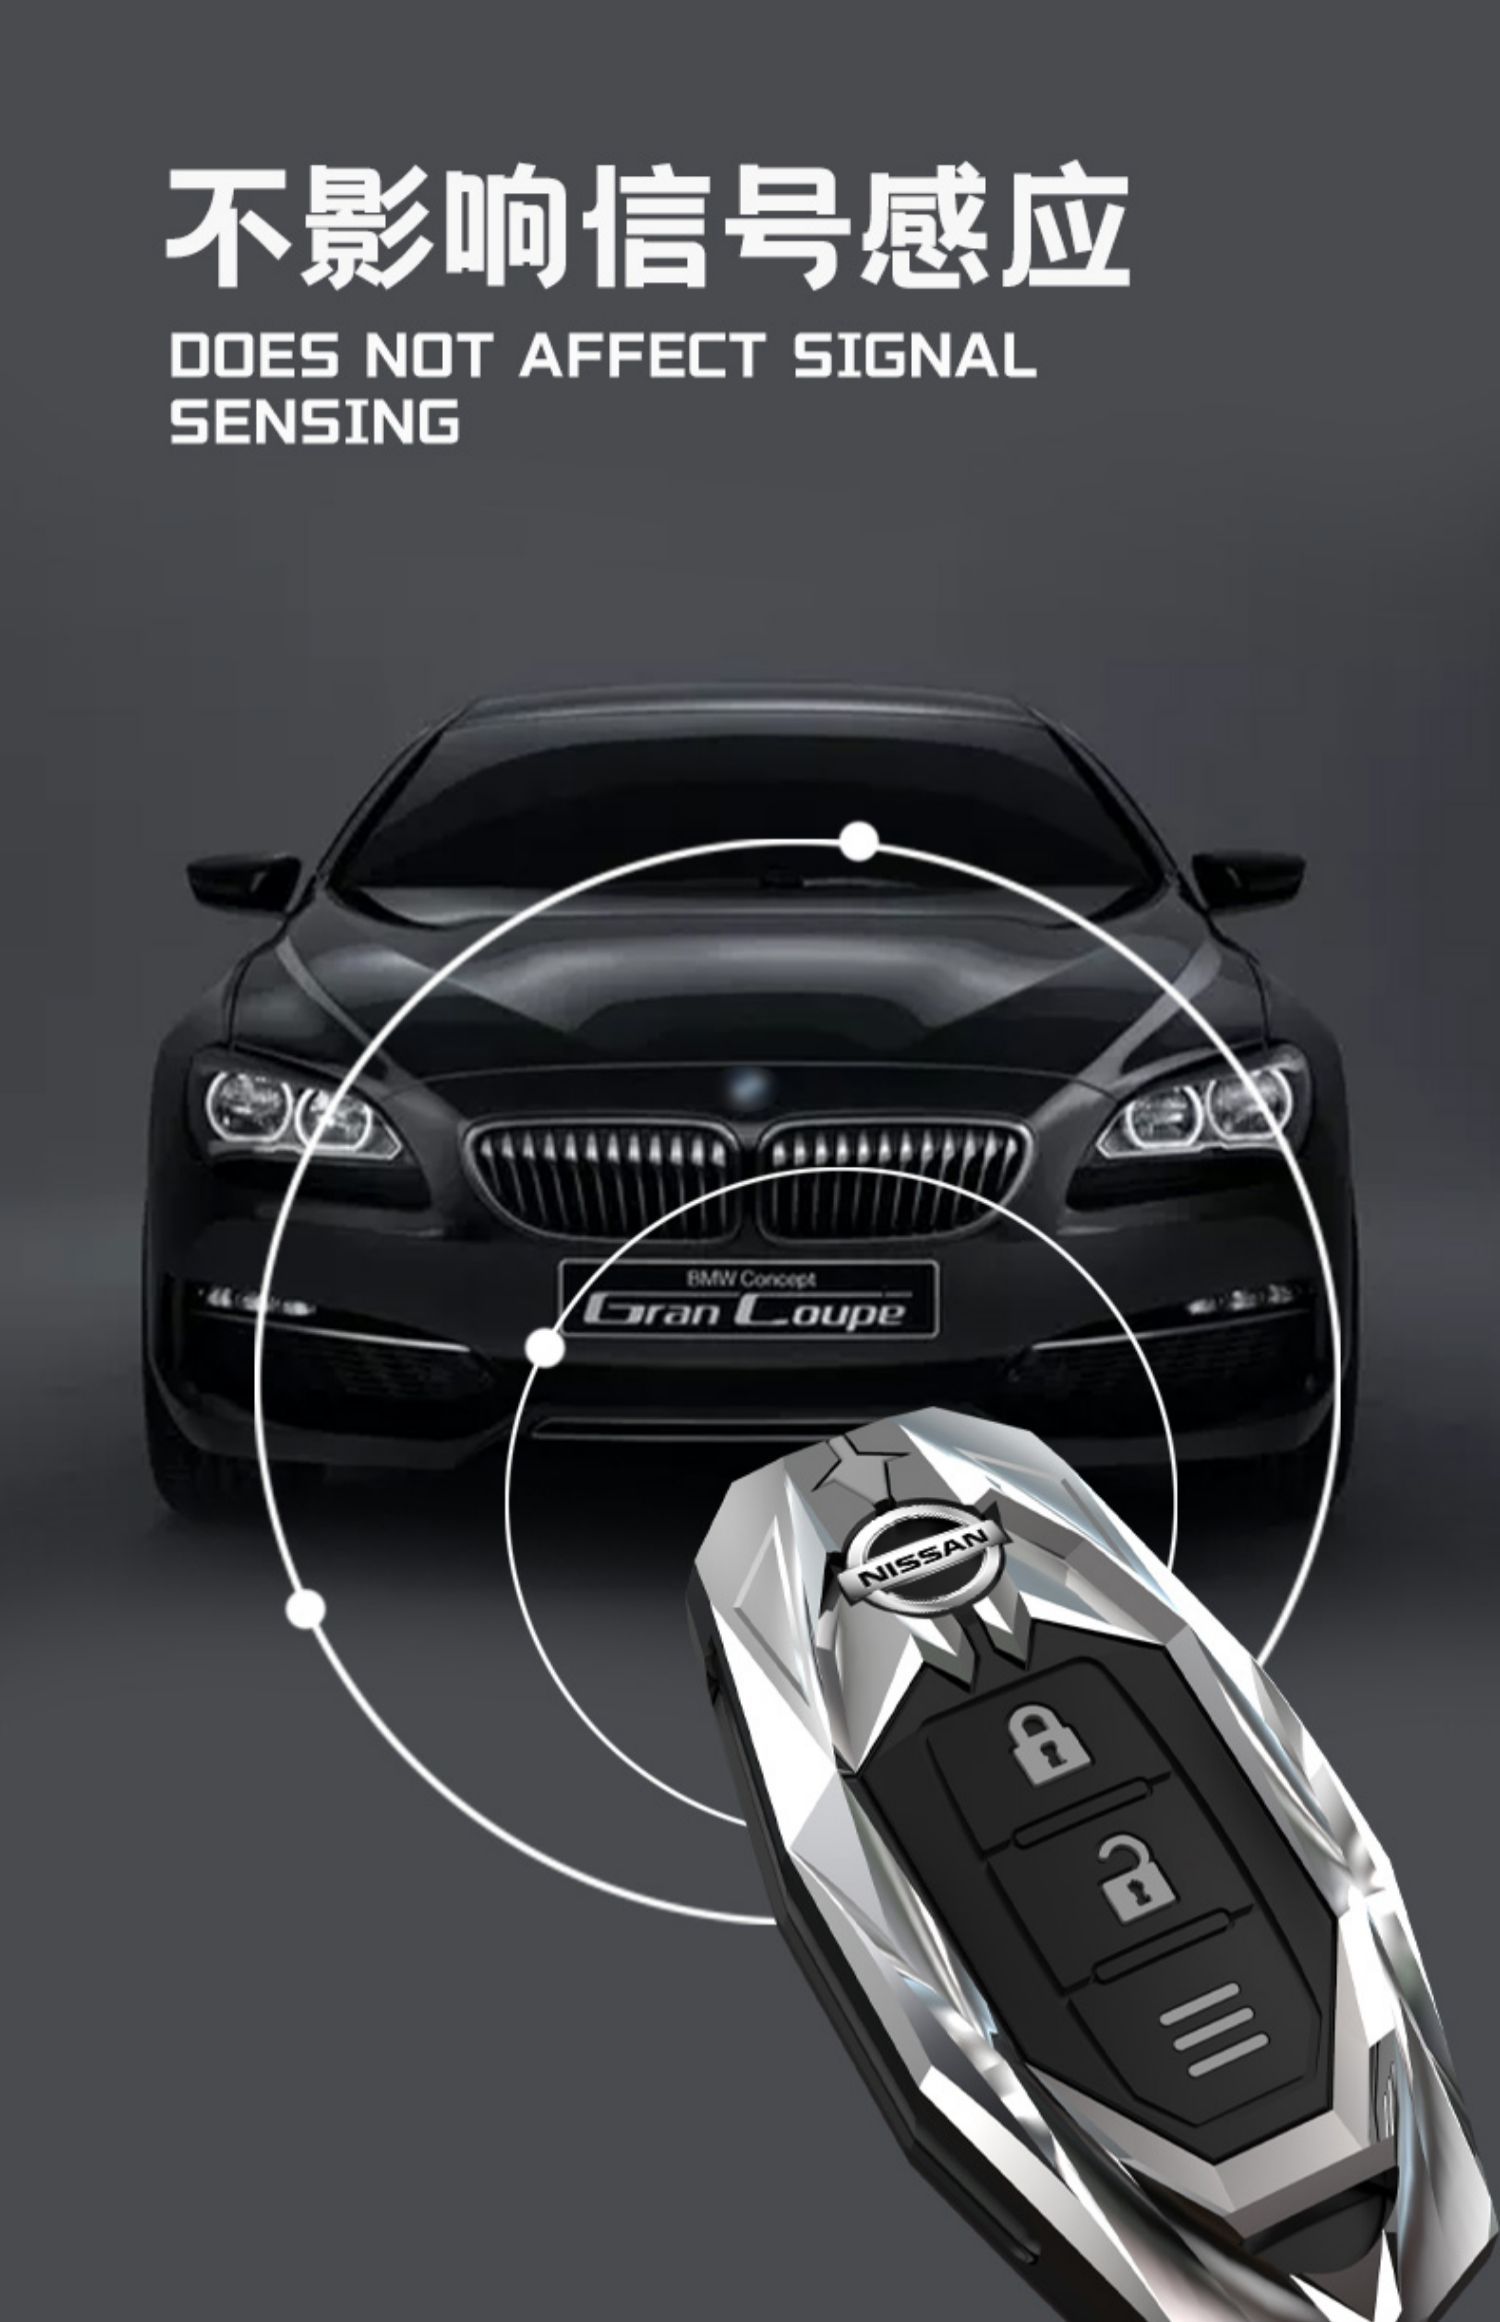 Ốp chìa khóa kim loại Nissan Xtrail , Terra, Navara - ảnh 6